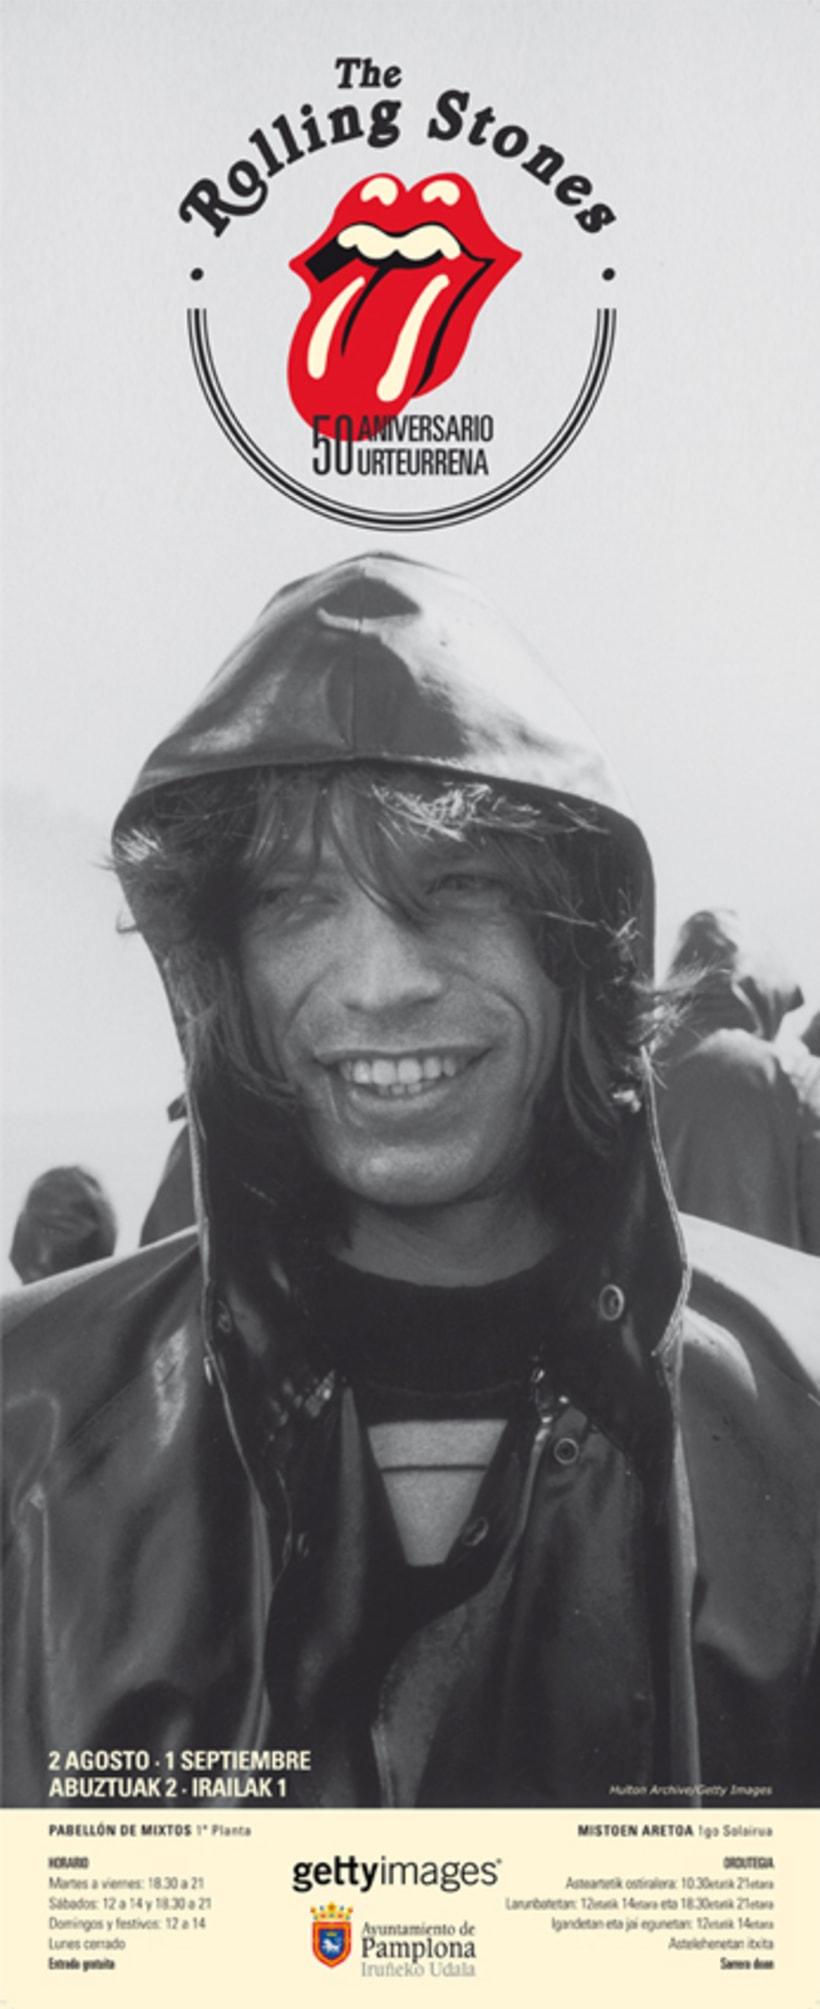 Rolling Stones 50 Aniversario 6